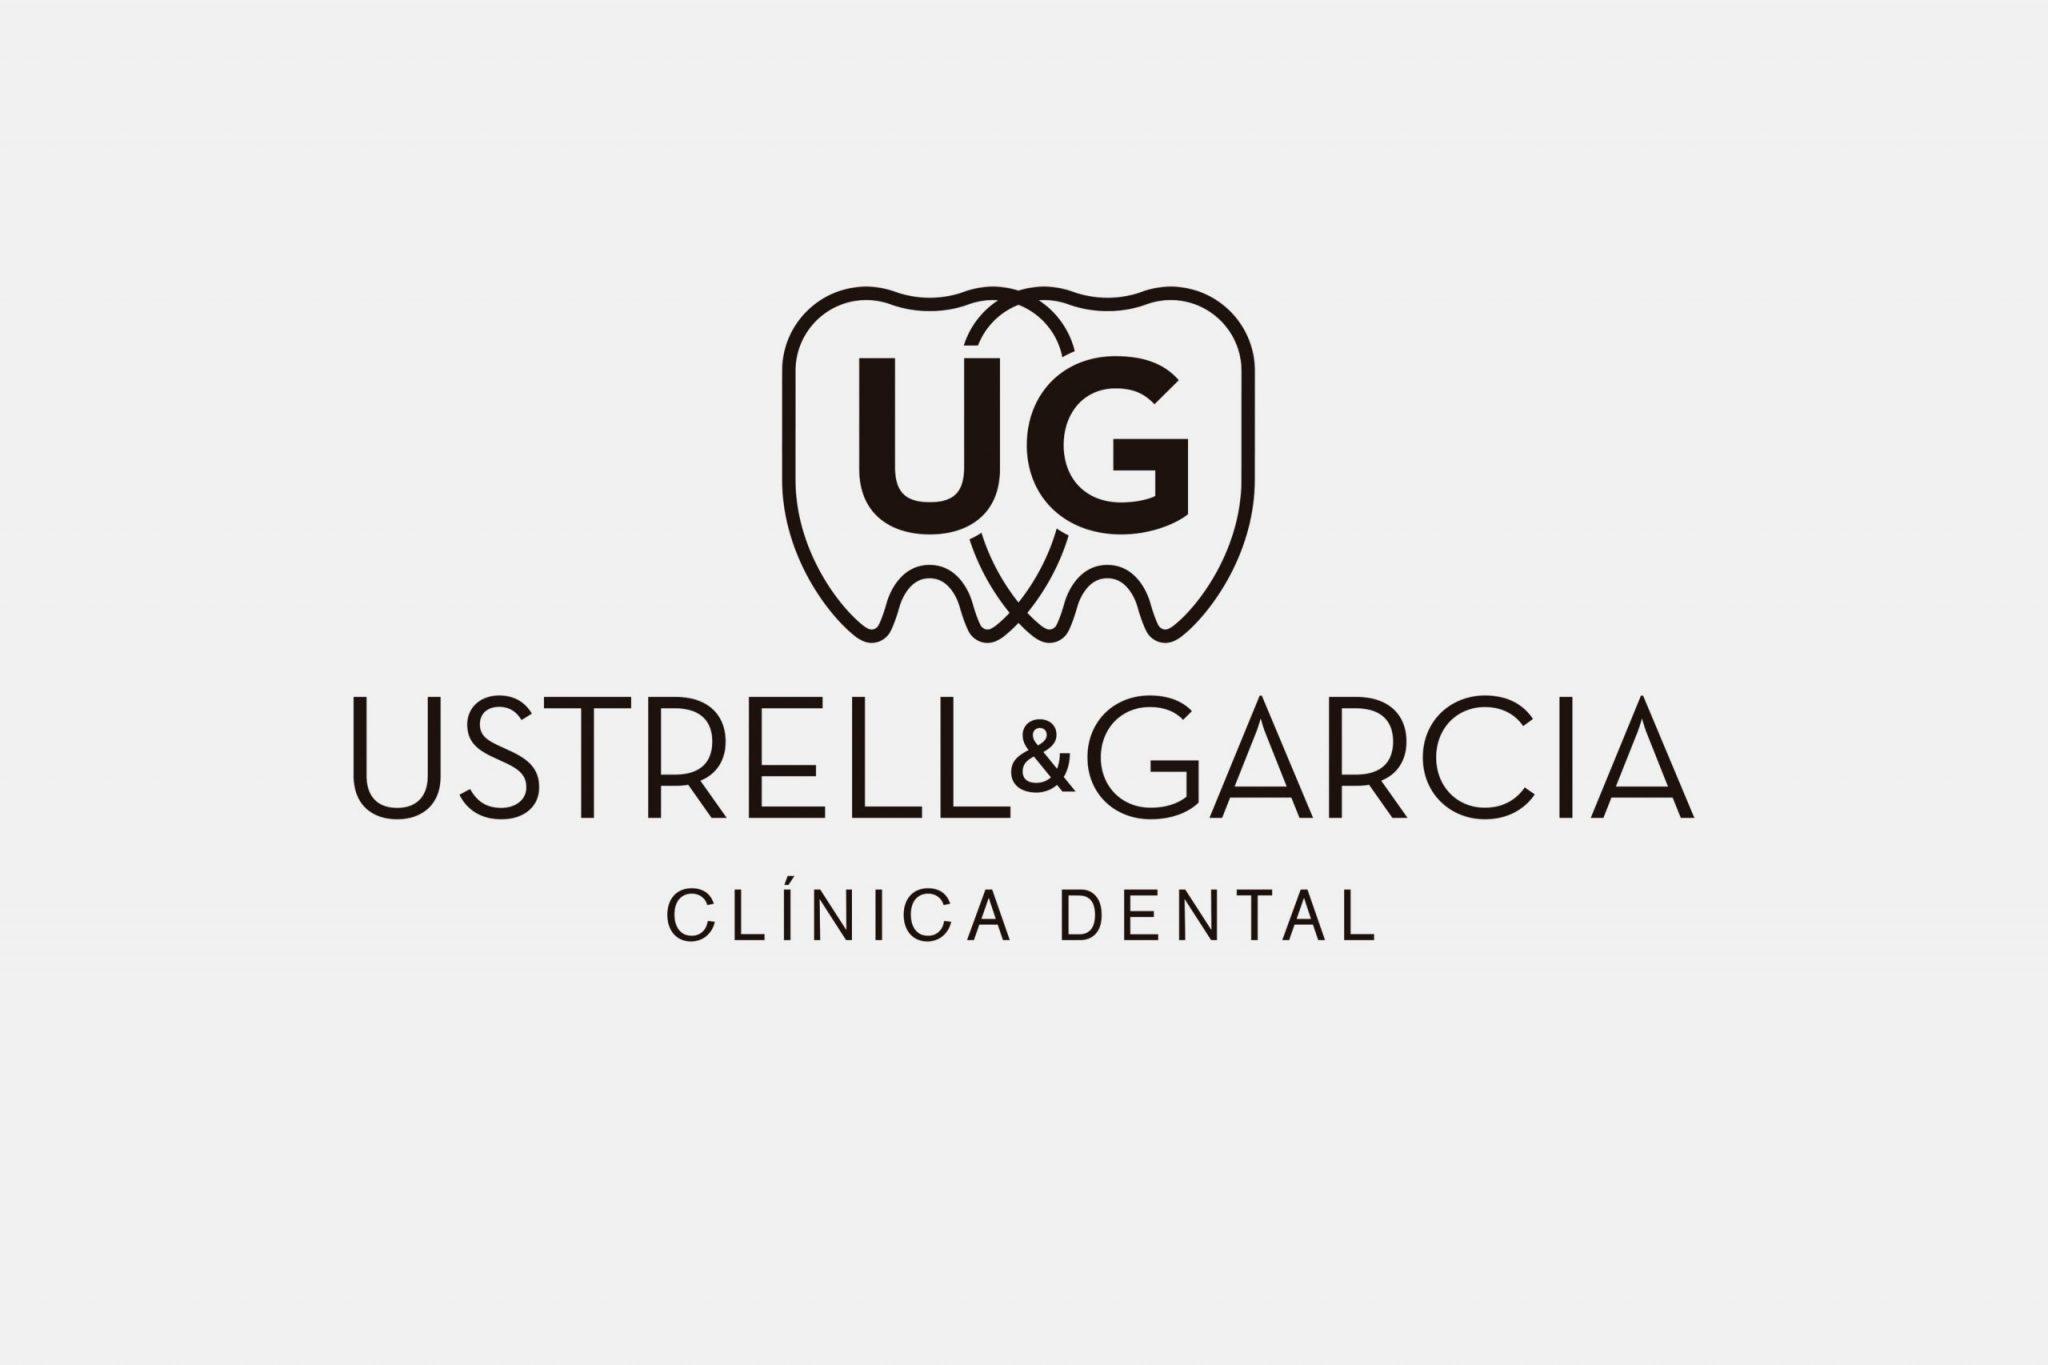 Logotip clínica dental 1 tinta